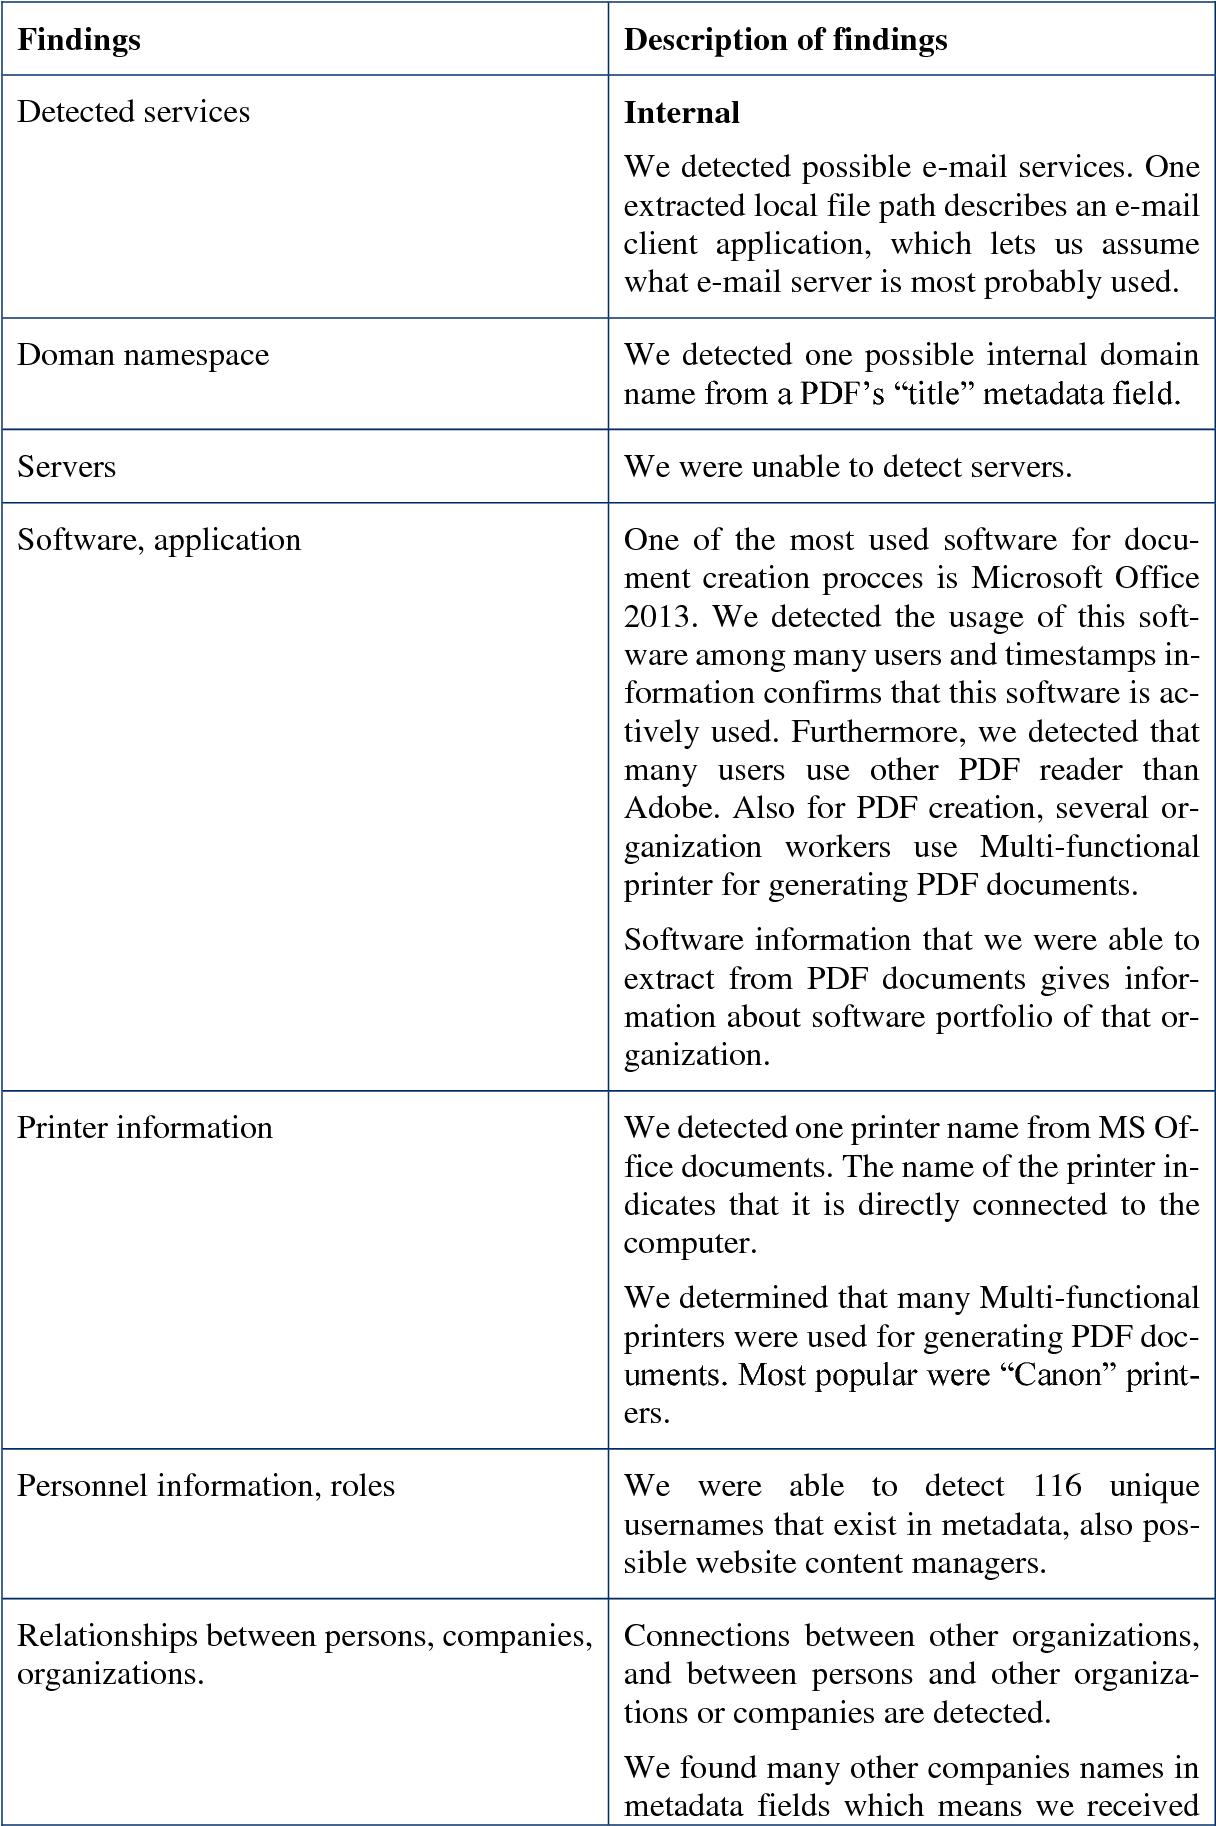 Table 13 from Mendelman Fingerprinting a Organization Using